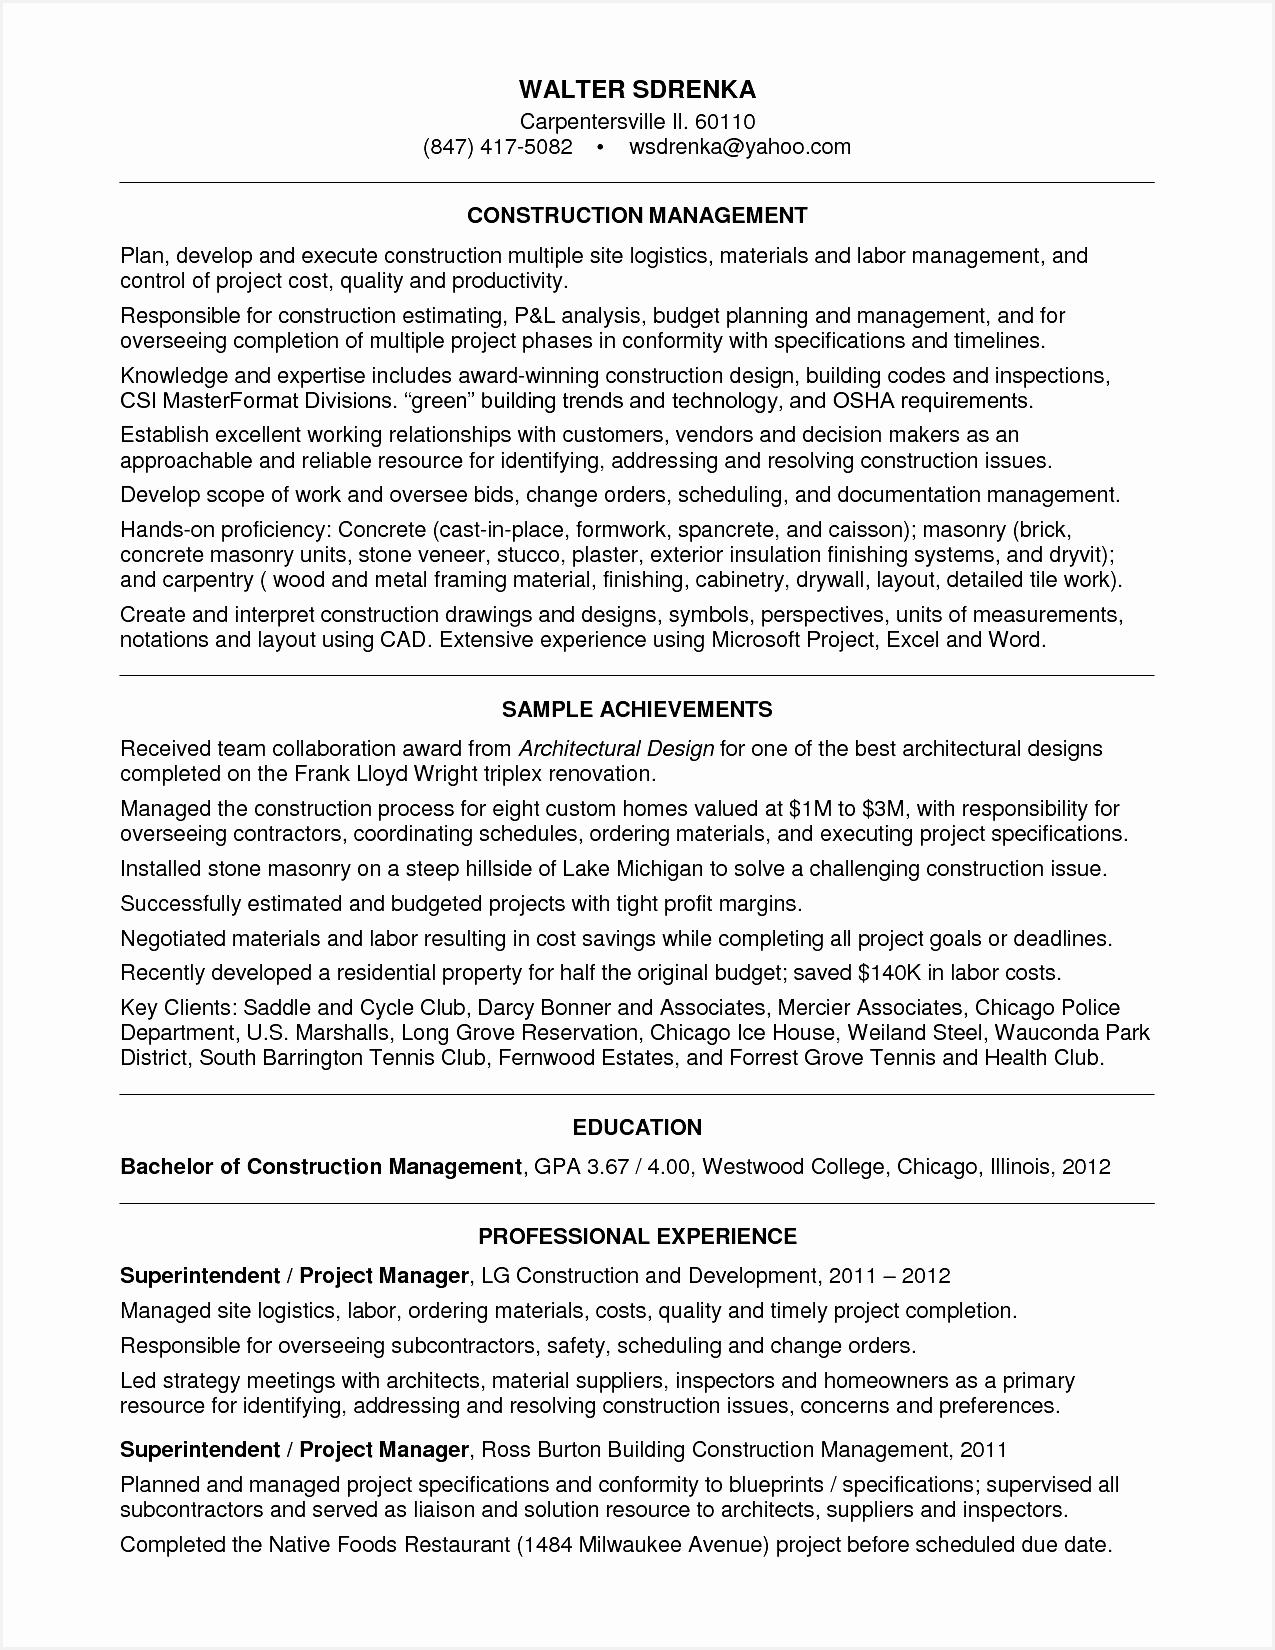 academic resume sample elegant sample rn resume best od consultant project management certification sacramento project management key skills resume sample16501275